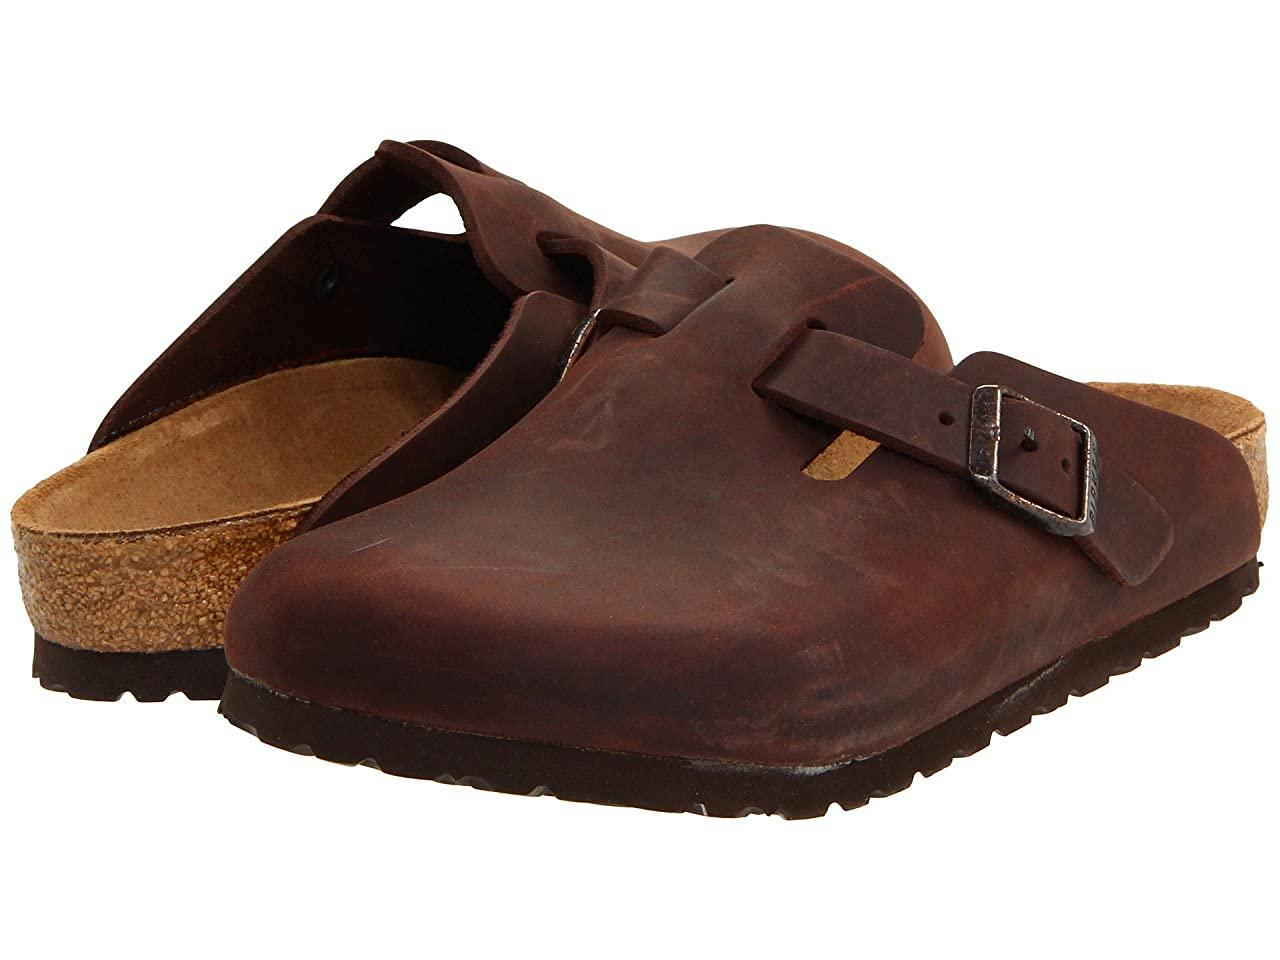 Сабо (Оригинал) Birkenstock Boston - Oiled Leather (Unisex) Habana Oiled Leather